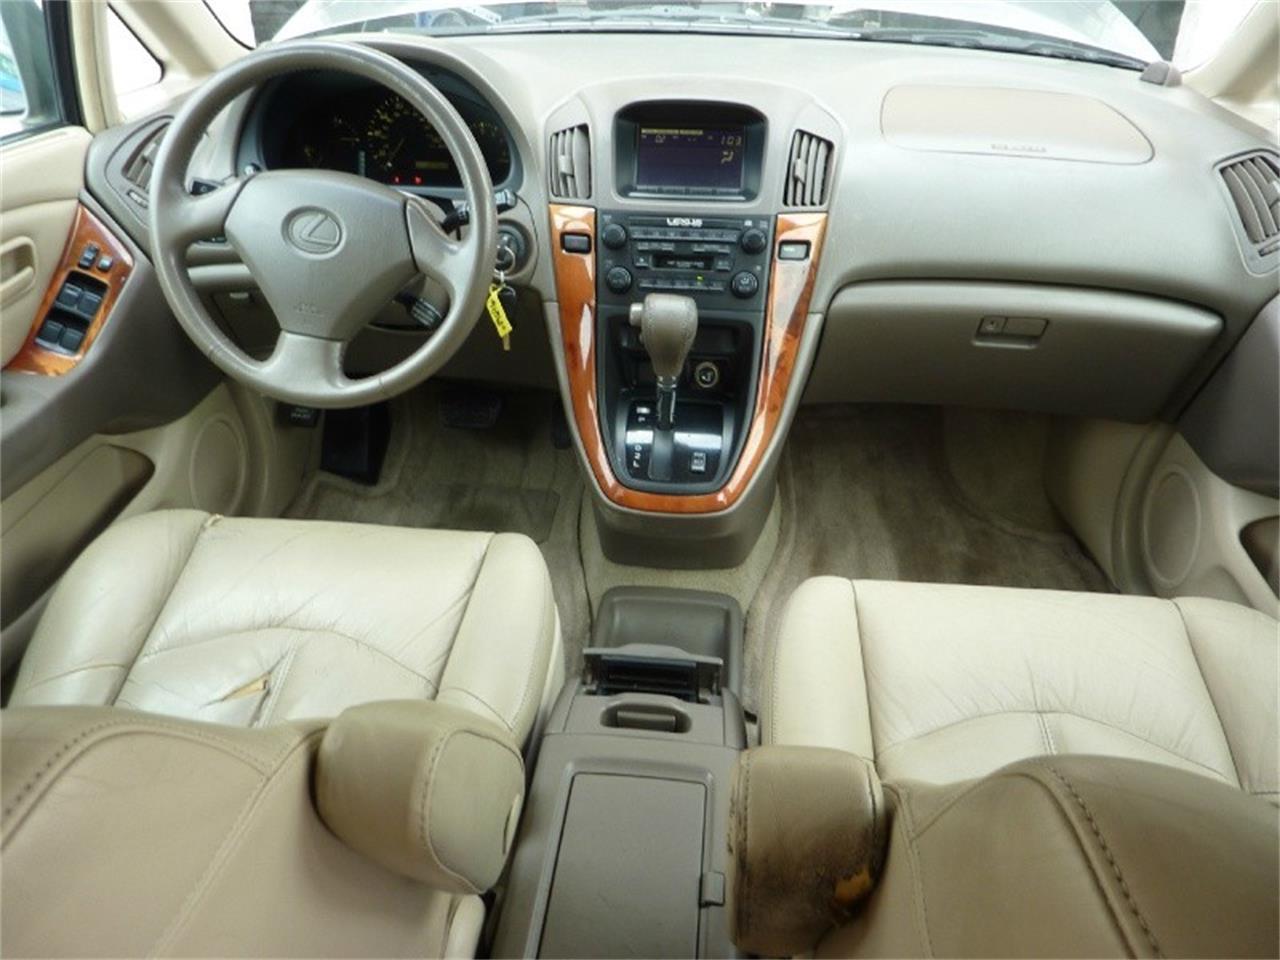 Large Picture of '00 Lexus RX located in Pahrump Nevada - $2,999.00 - Q1K7